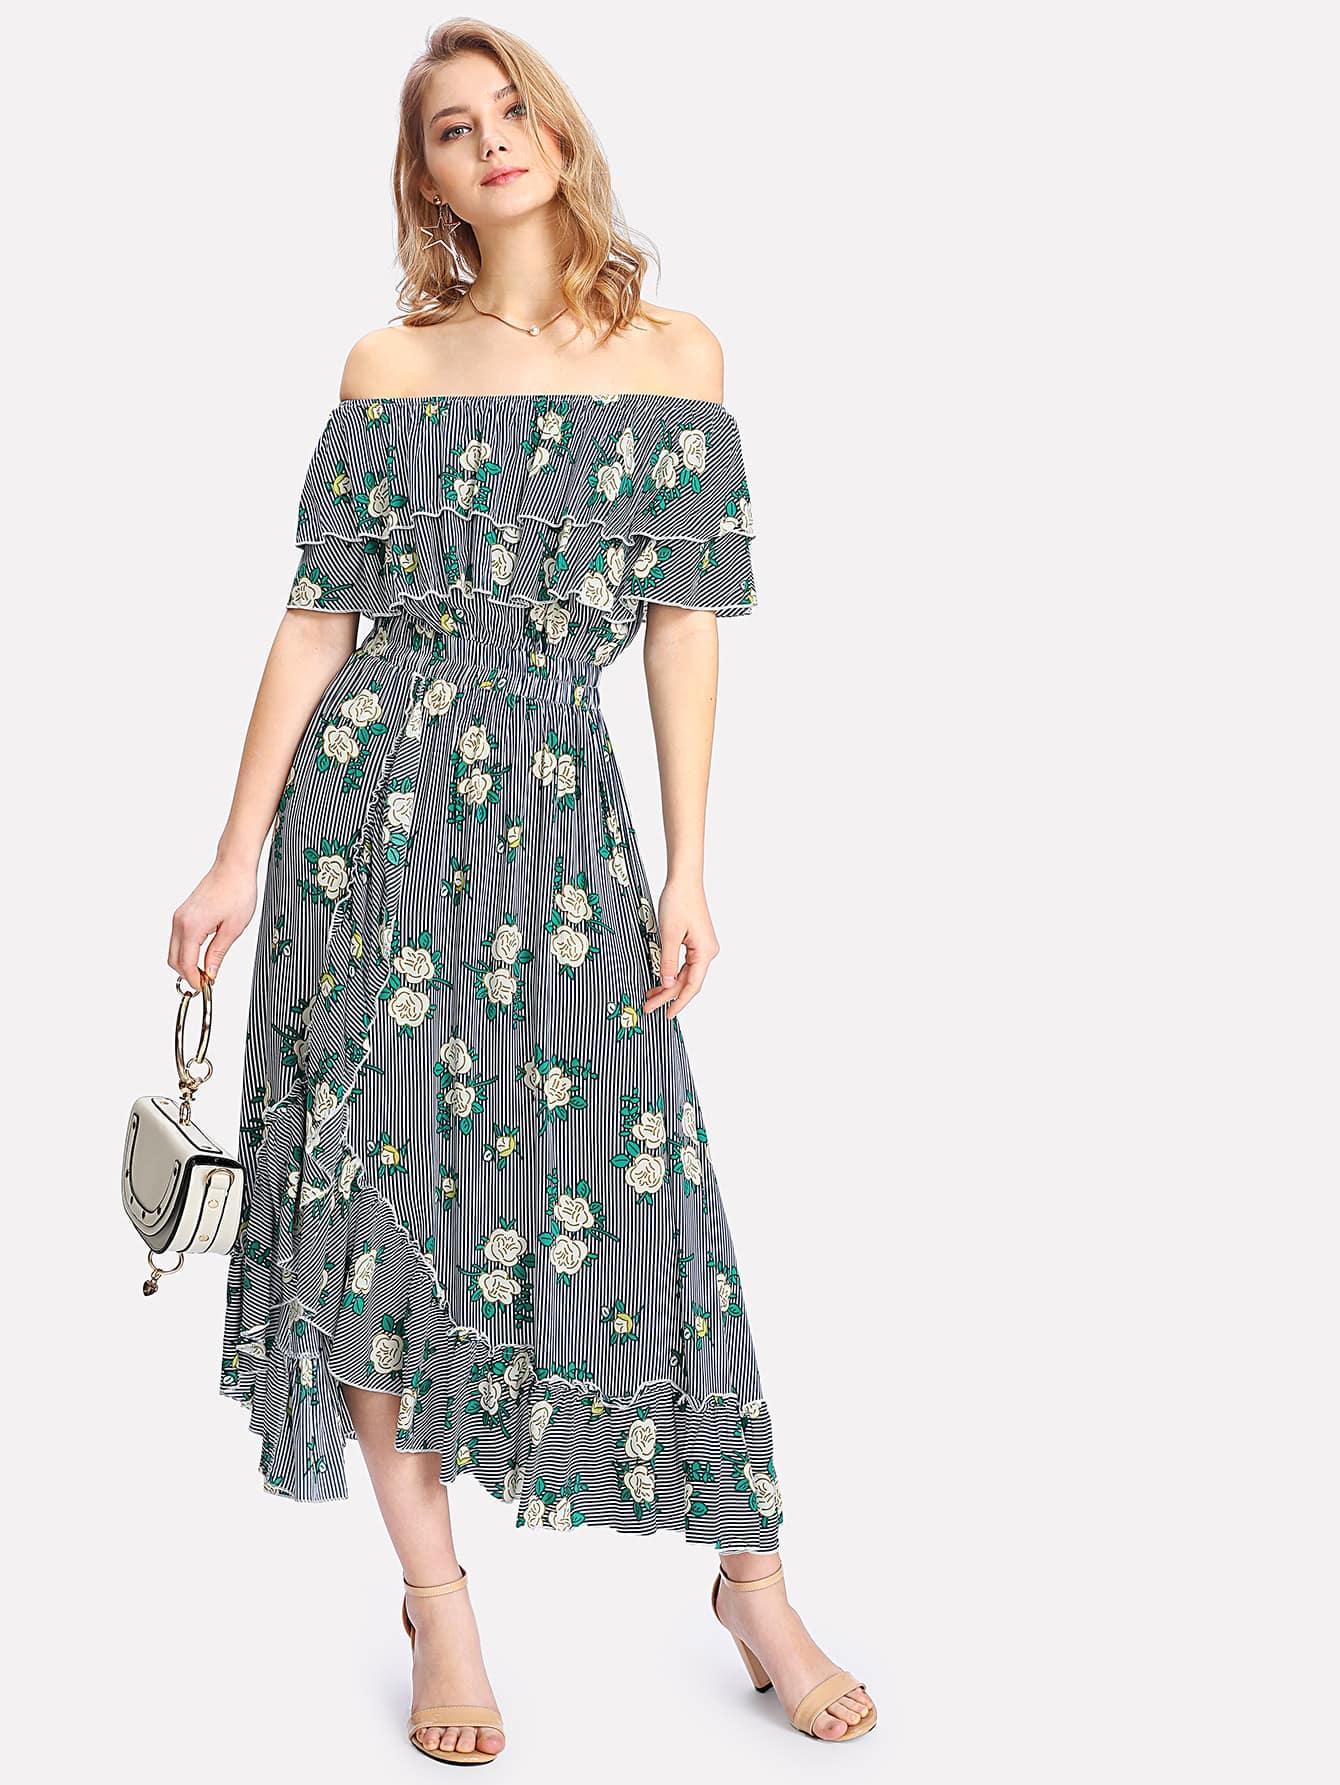 Mixed Print Tiered Ruffle Bardot Dress mixed print dress